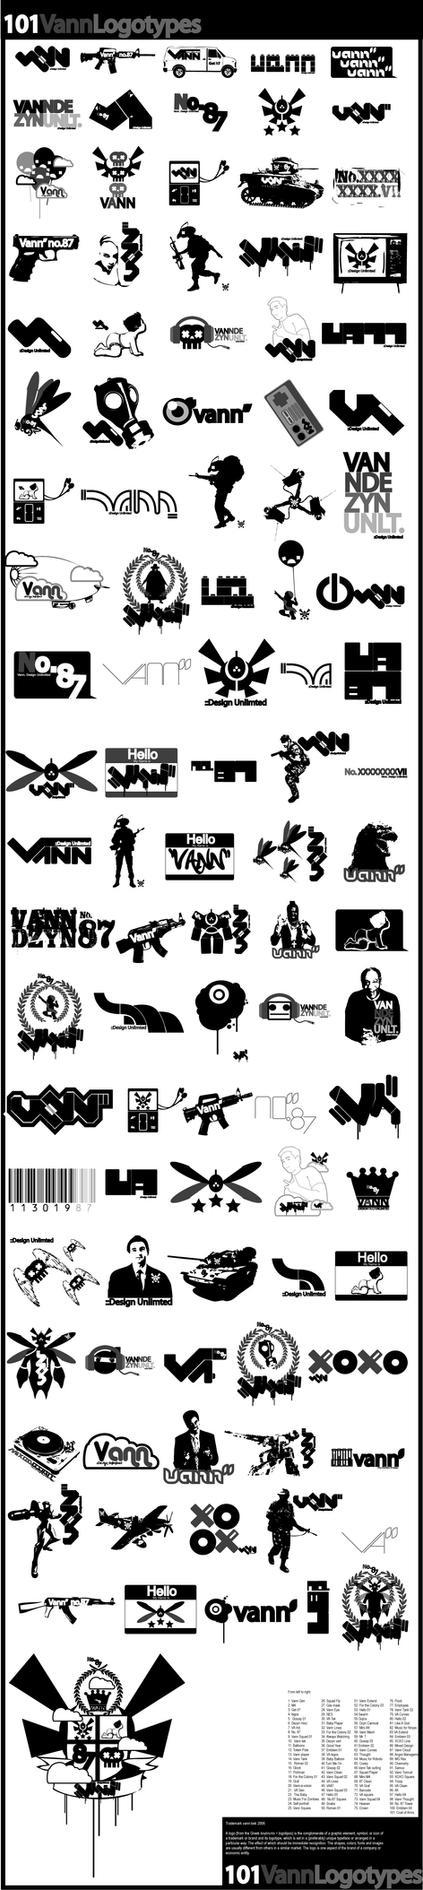 101 vann logotypes by vann-bek